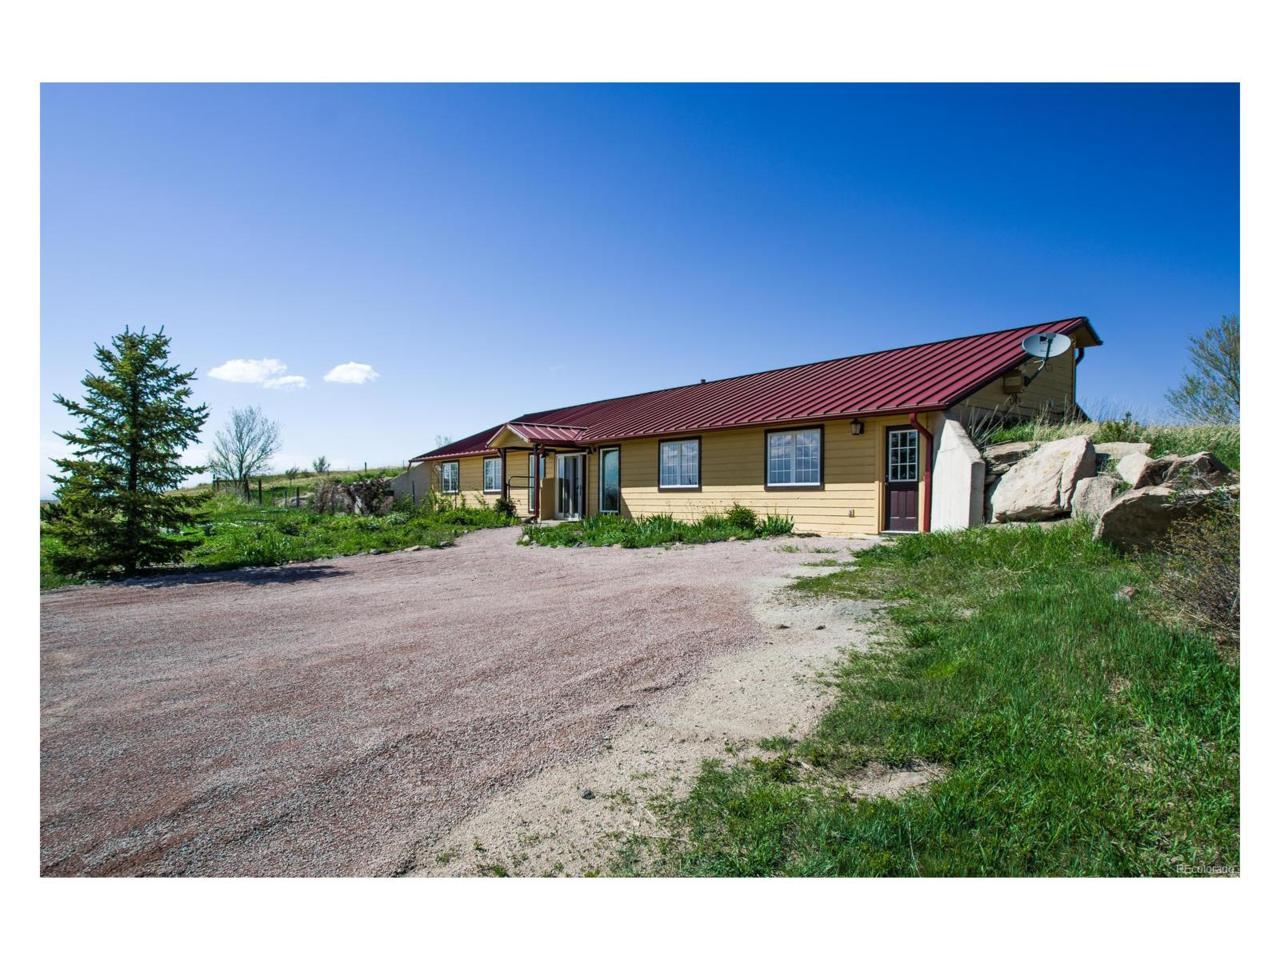 26700 County Road 21, Elbert, CO 80106 (MLS #5883799) :: 8z Real Estate